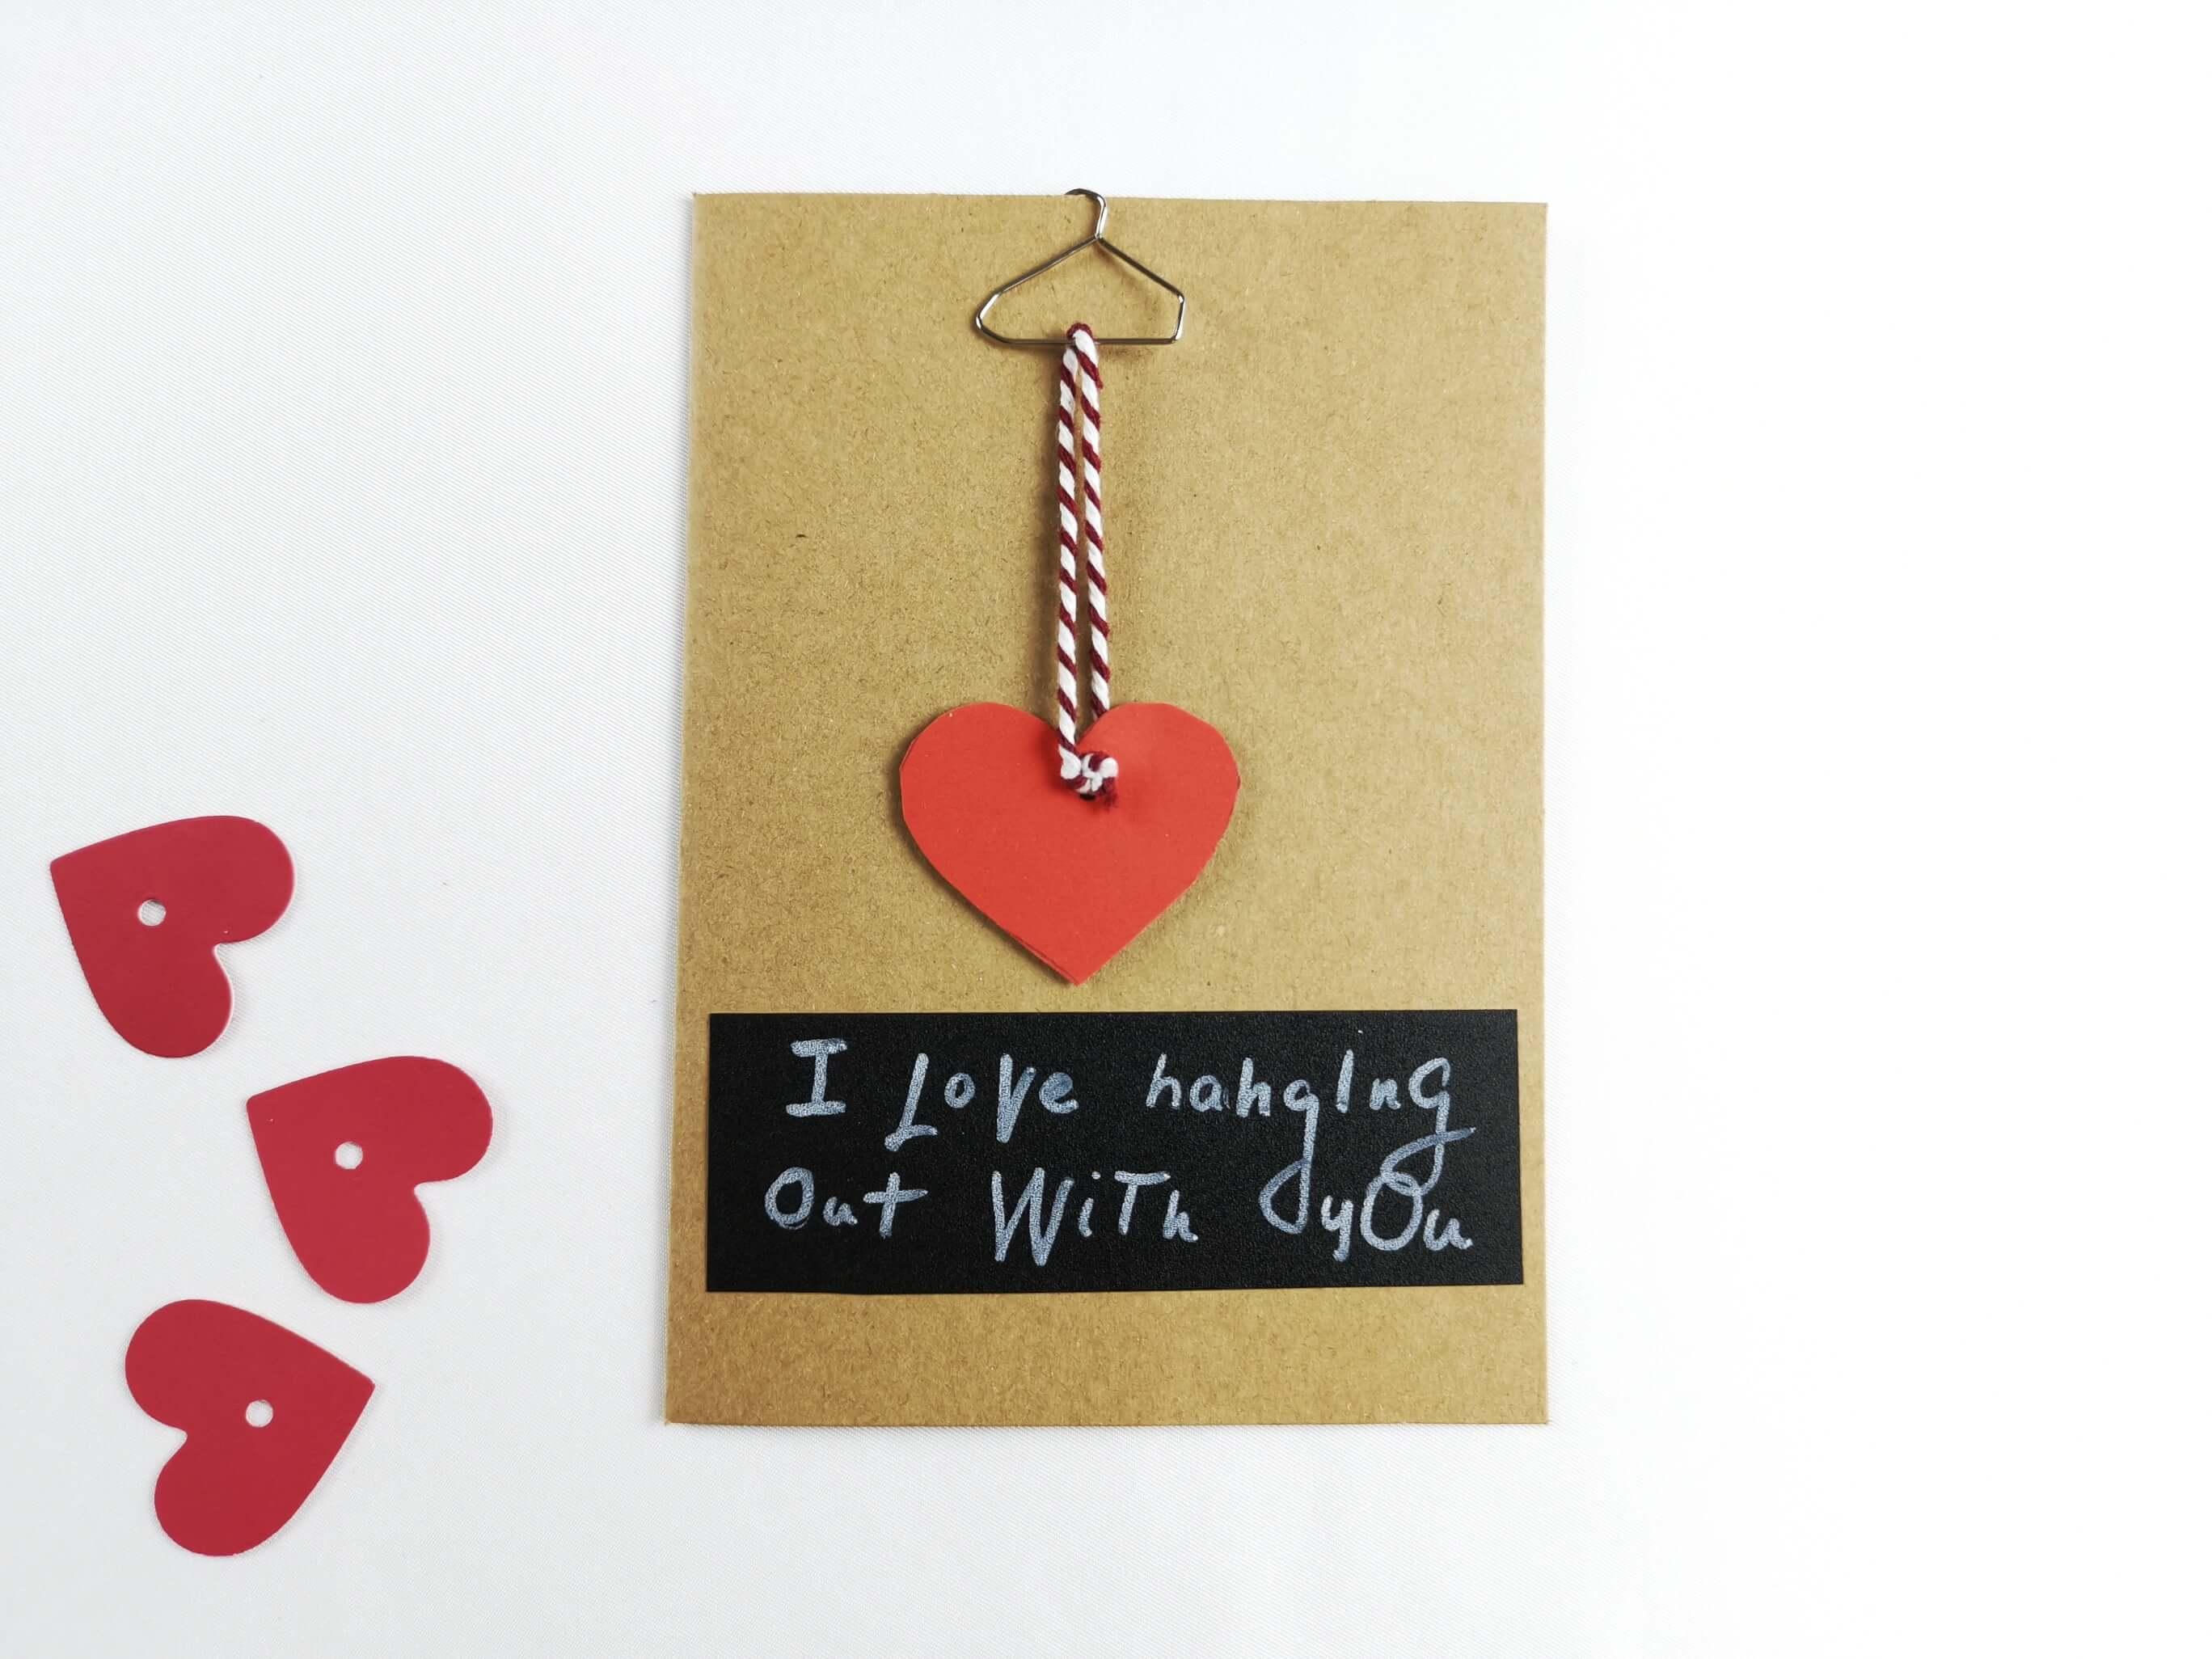 IMG 20190204 171339 01 resized 20190204 074340605 - Nur keine Panik! Last minute Valentinstagsgeschenke